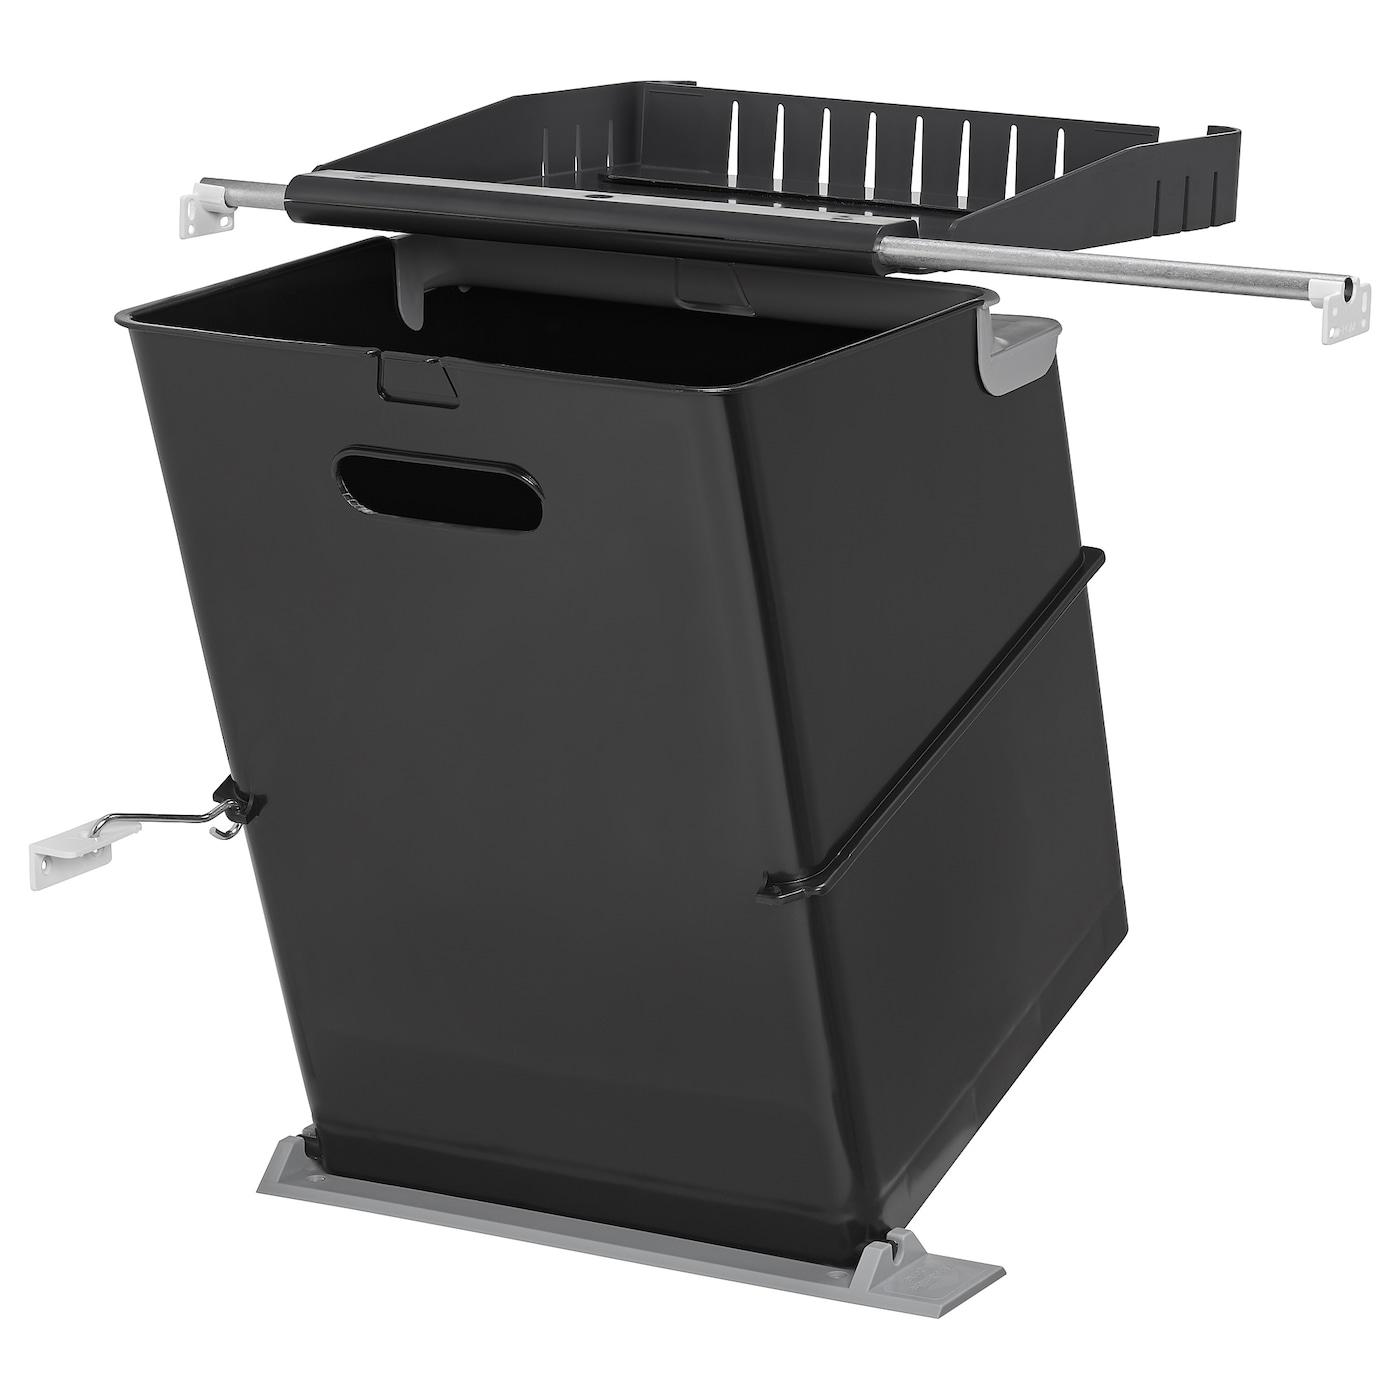 Vorgod Pedal Bin Stainless Steel Colour 3 L Ikea